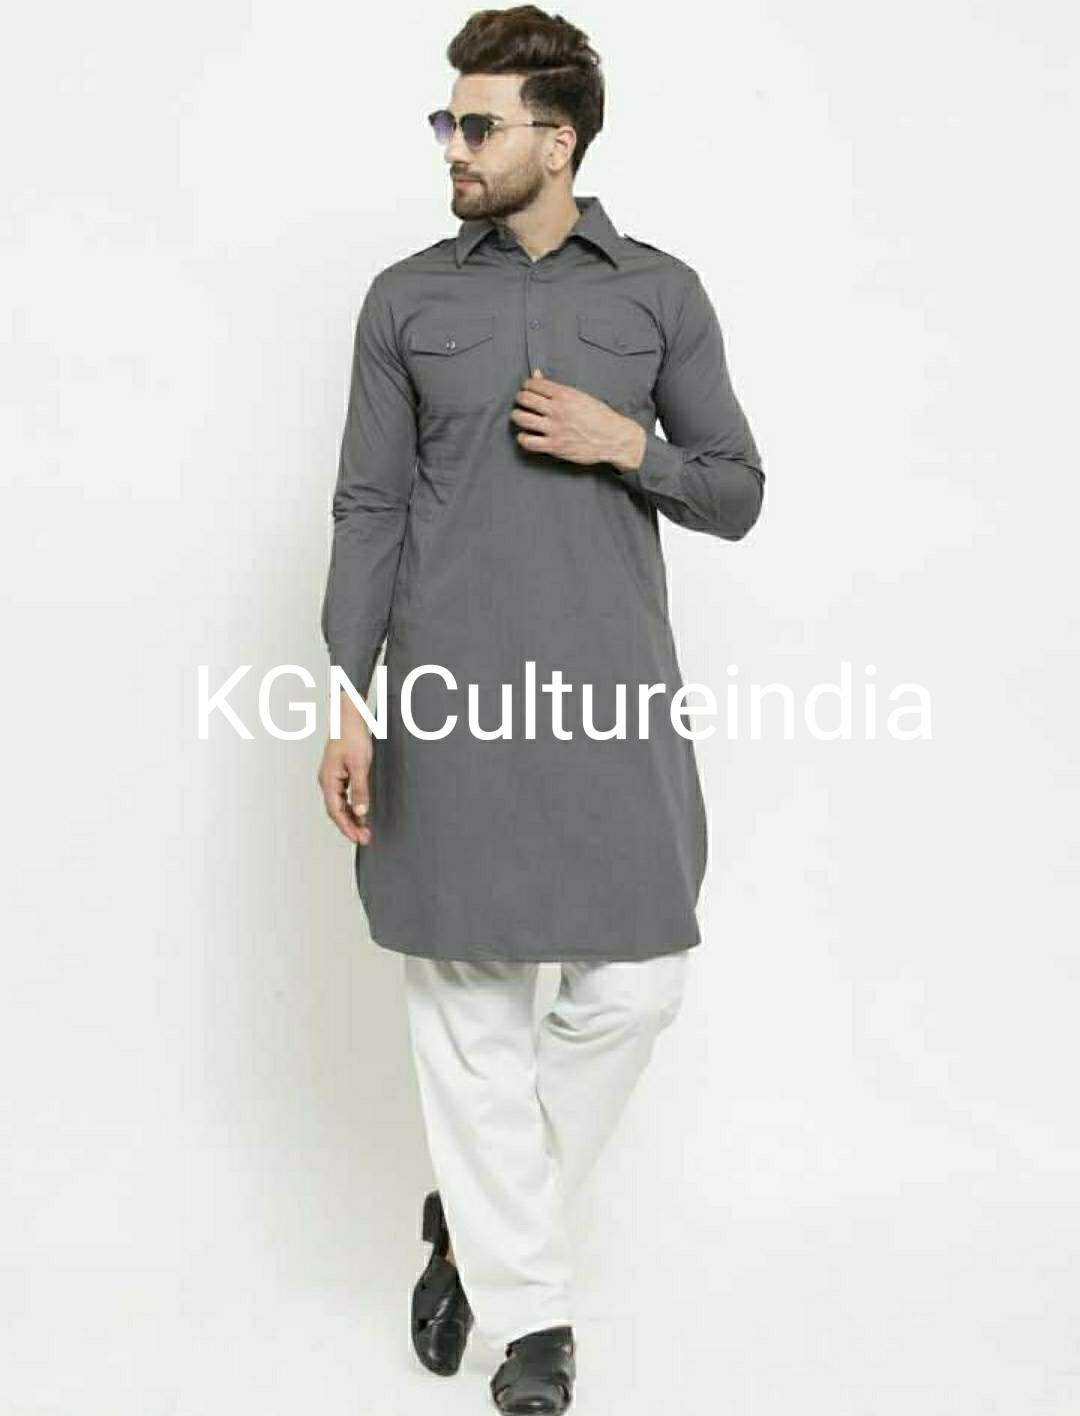 New Indian long pathani Kurta round neck collar simpal look and altimet pes for Indian look designs patani  Kurta white color